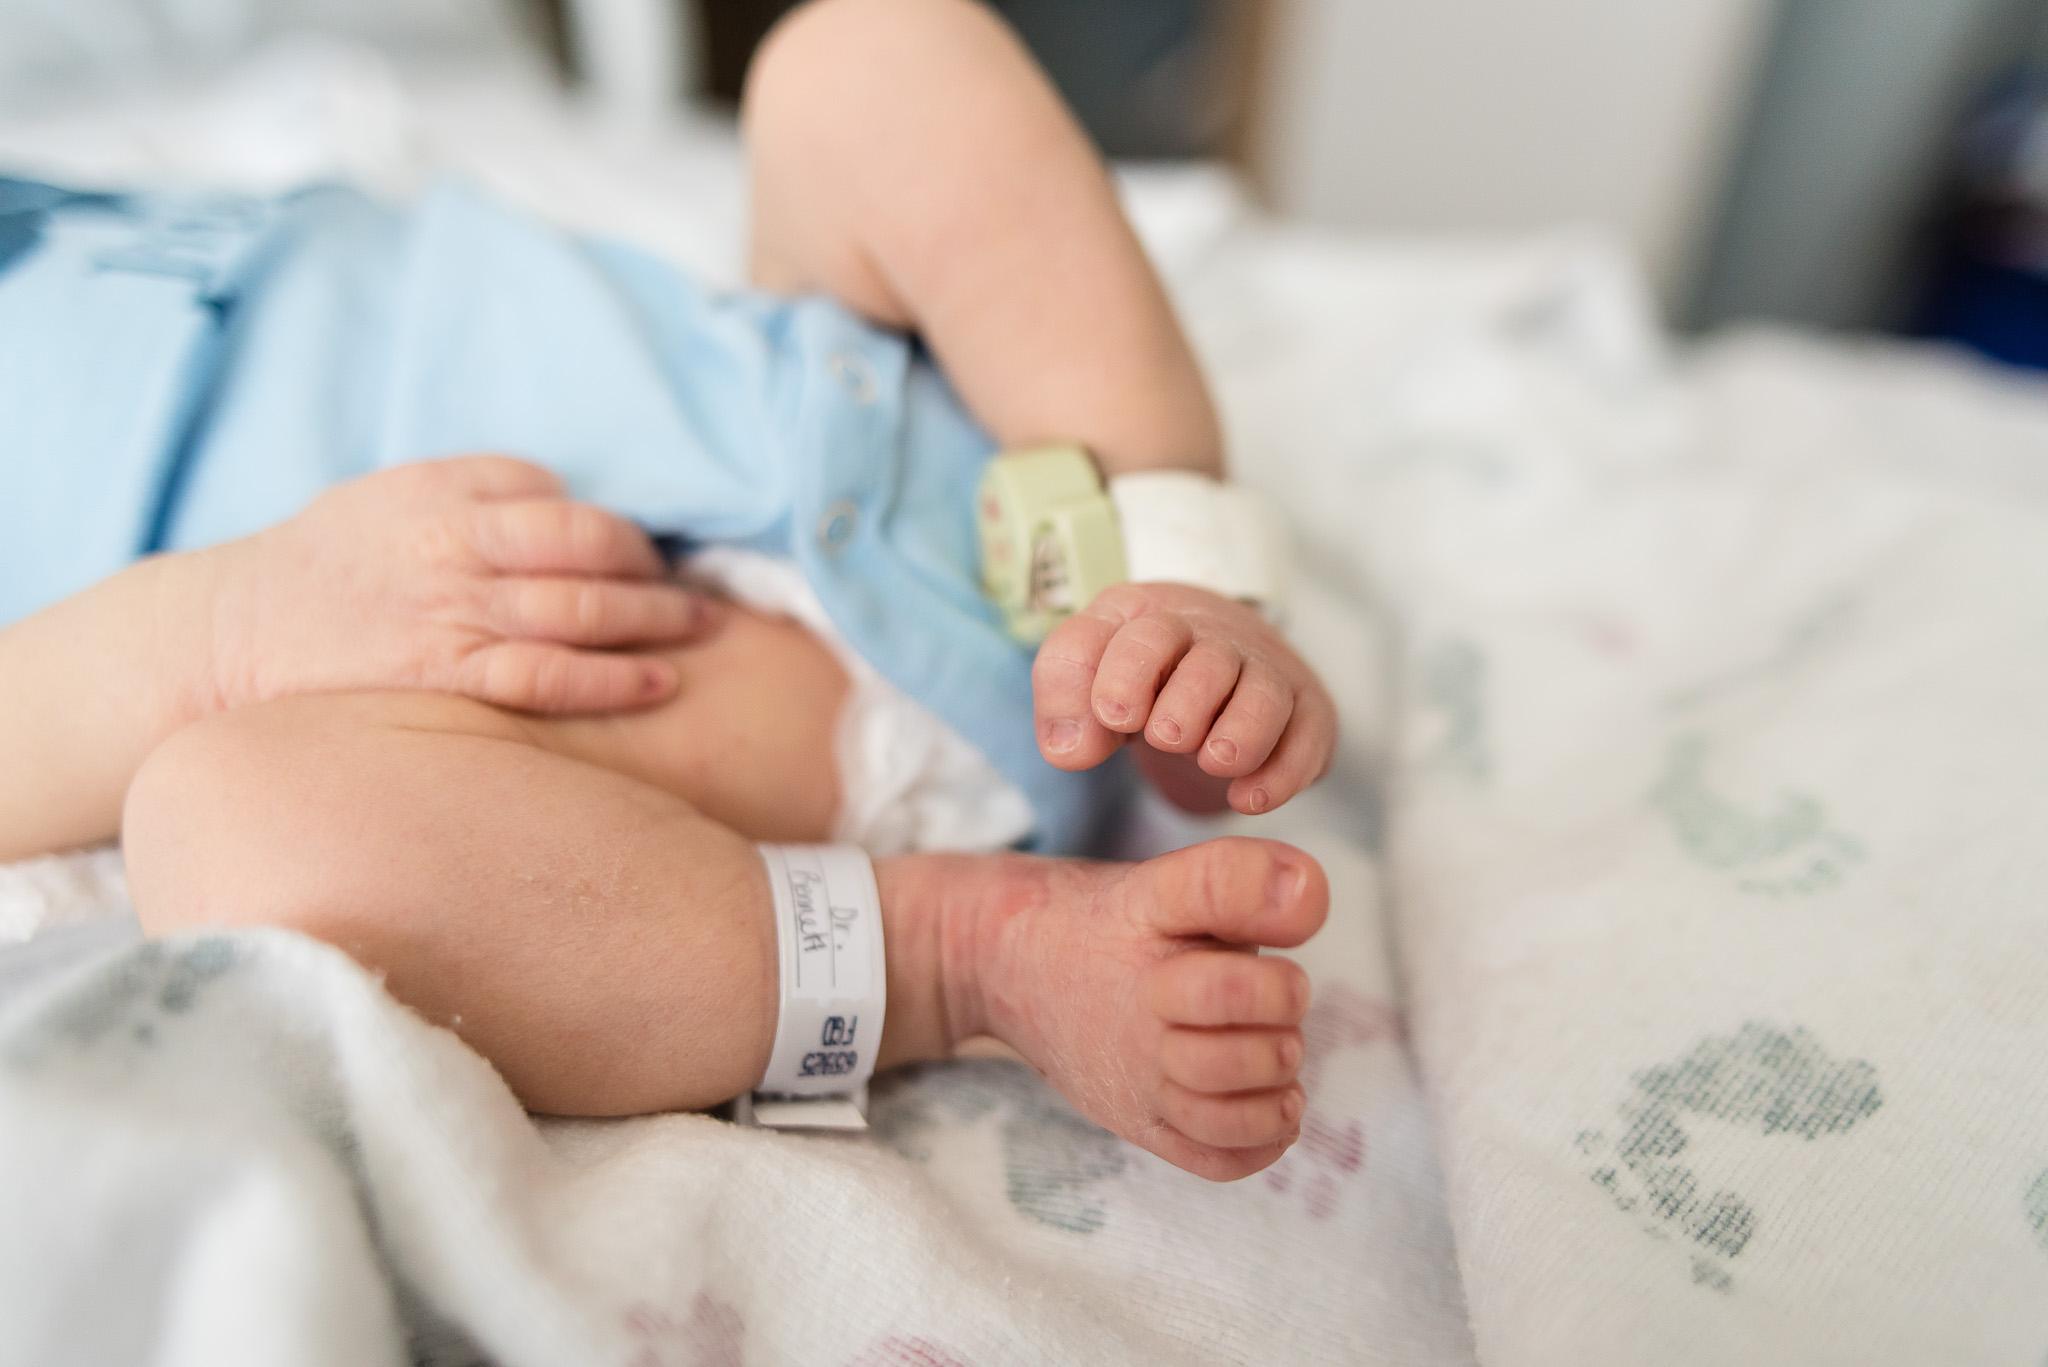 silver-spring-newborn-birth-photographers-tabitha-maegan-photography-7